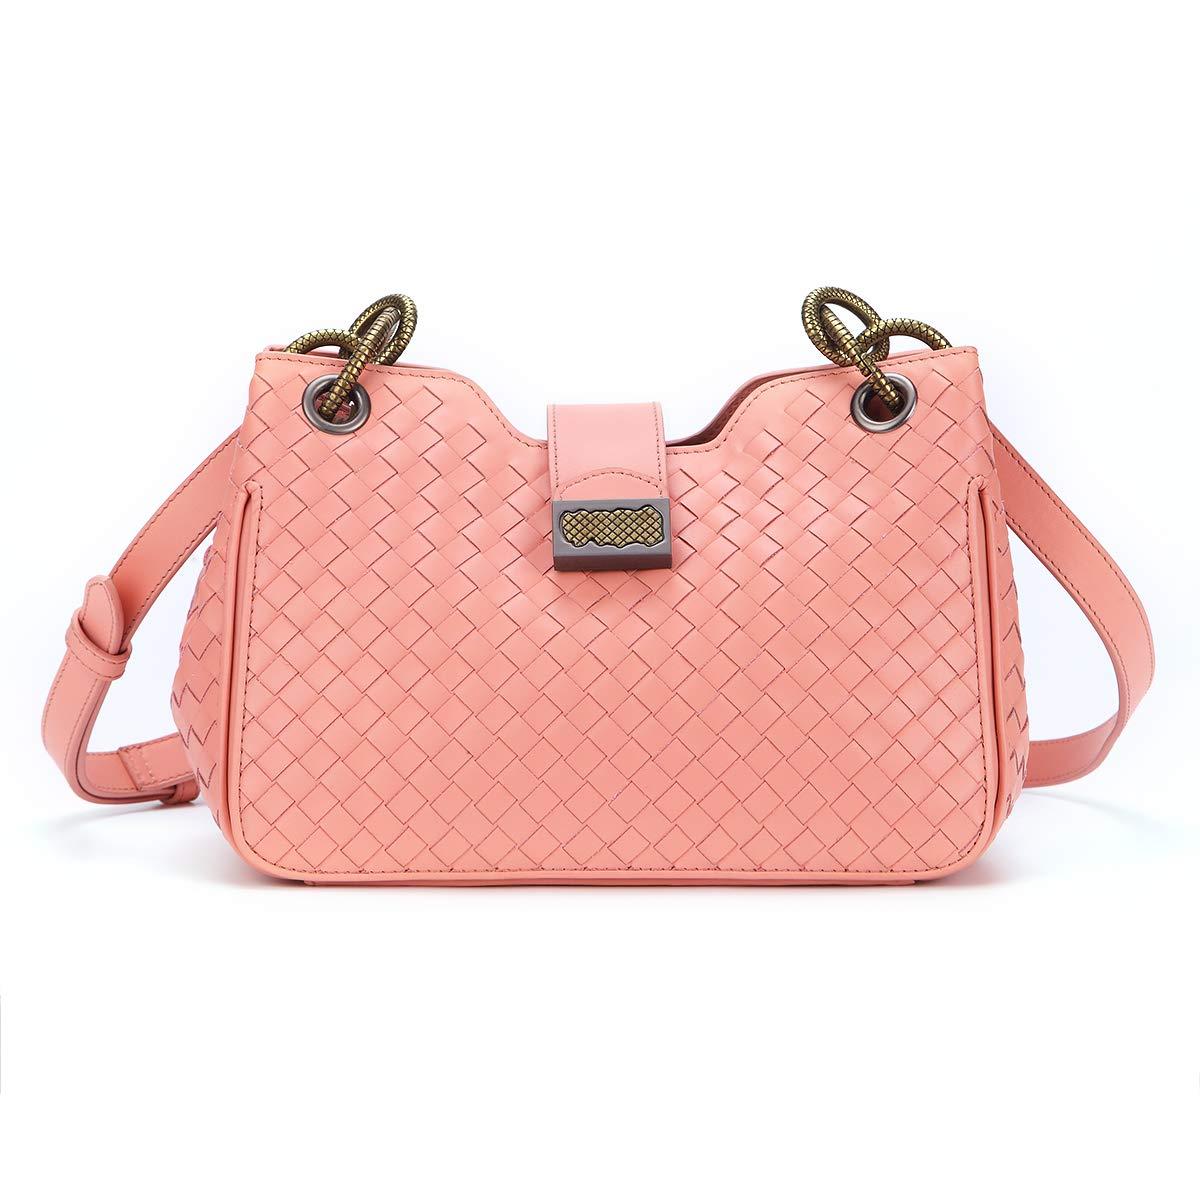 White Newest Genuine Leather Shoulder Bag Hobo Bag Crossbody Bag Purse for Women